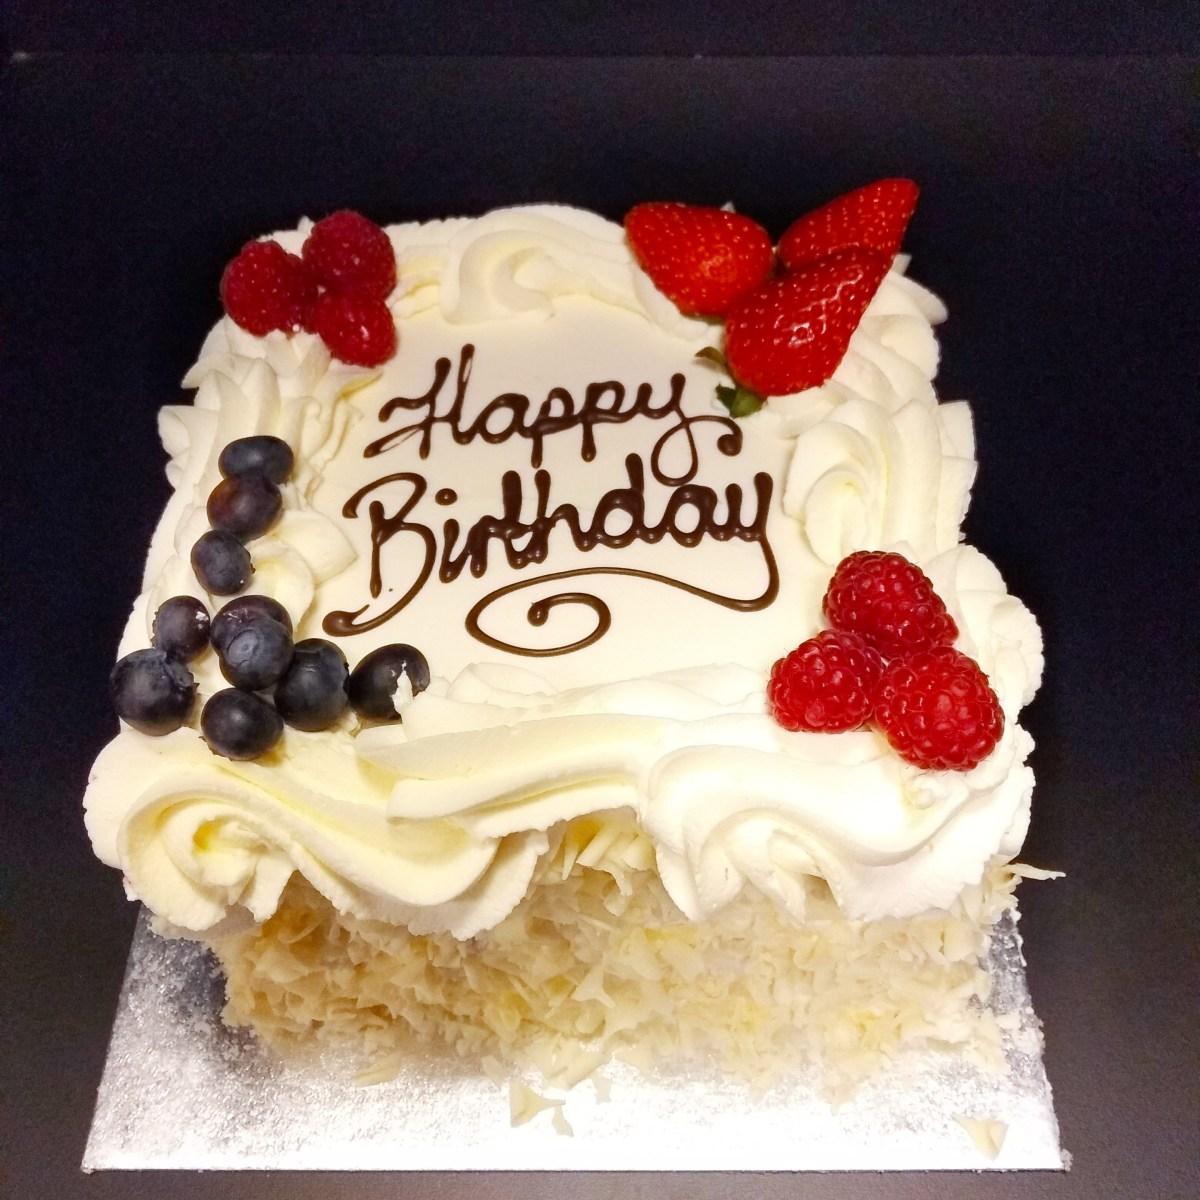 Tremendous Square Birthday Cakes 6 Square Birthday Cakeplain Sponge Fresh Funny Birthday Cards Online Overcheapnameinfo